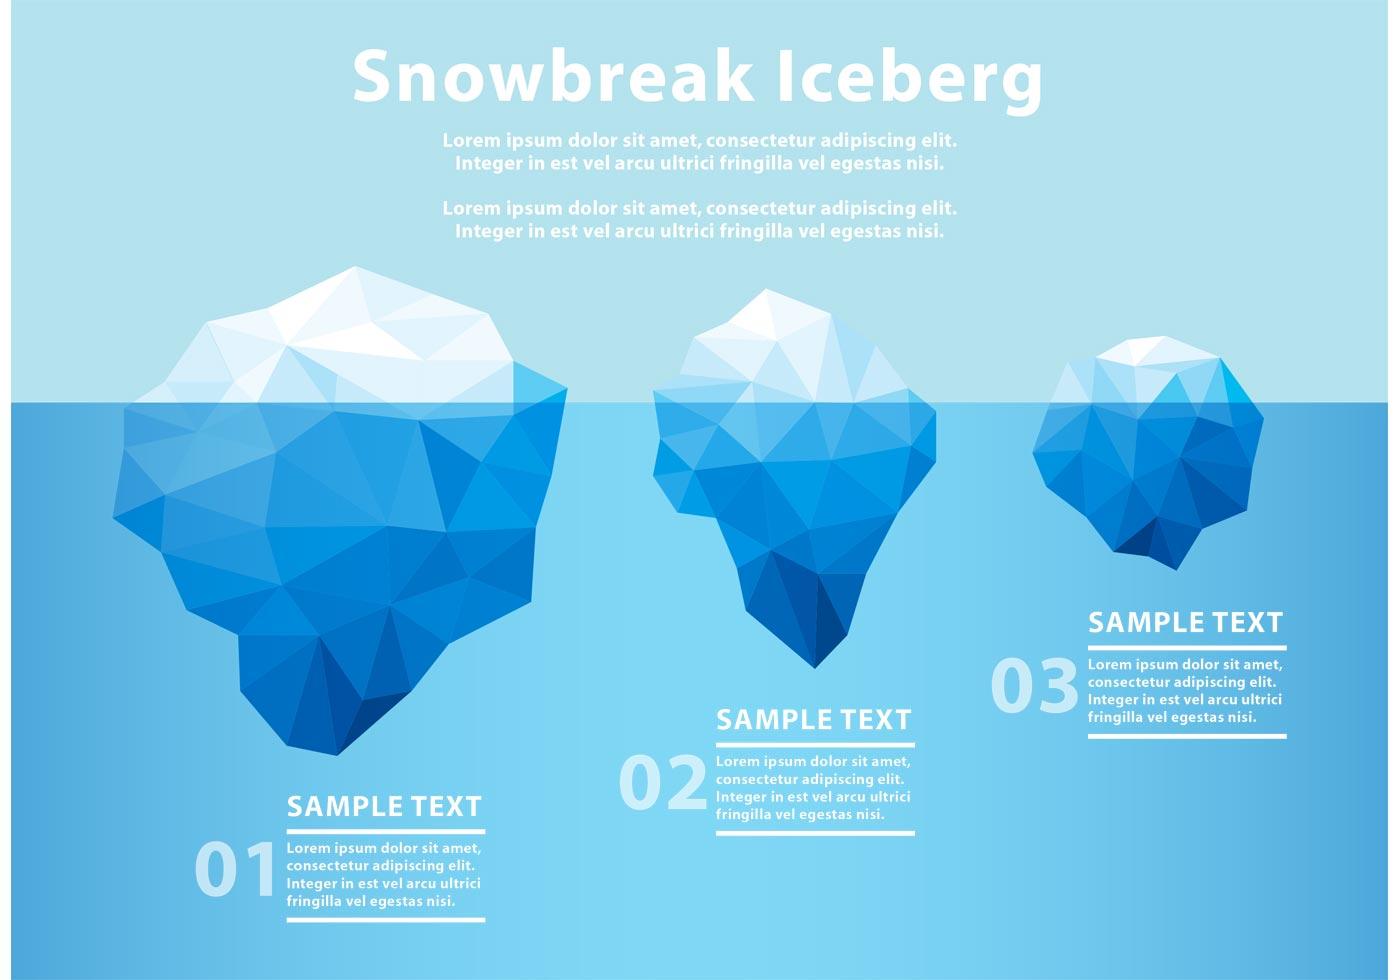 polar bear diagram 2016 dodge ram trailer plug wiring polygonal iceberg underwater - download free vector art, stock graphics & images